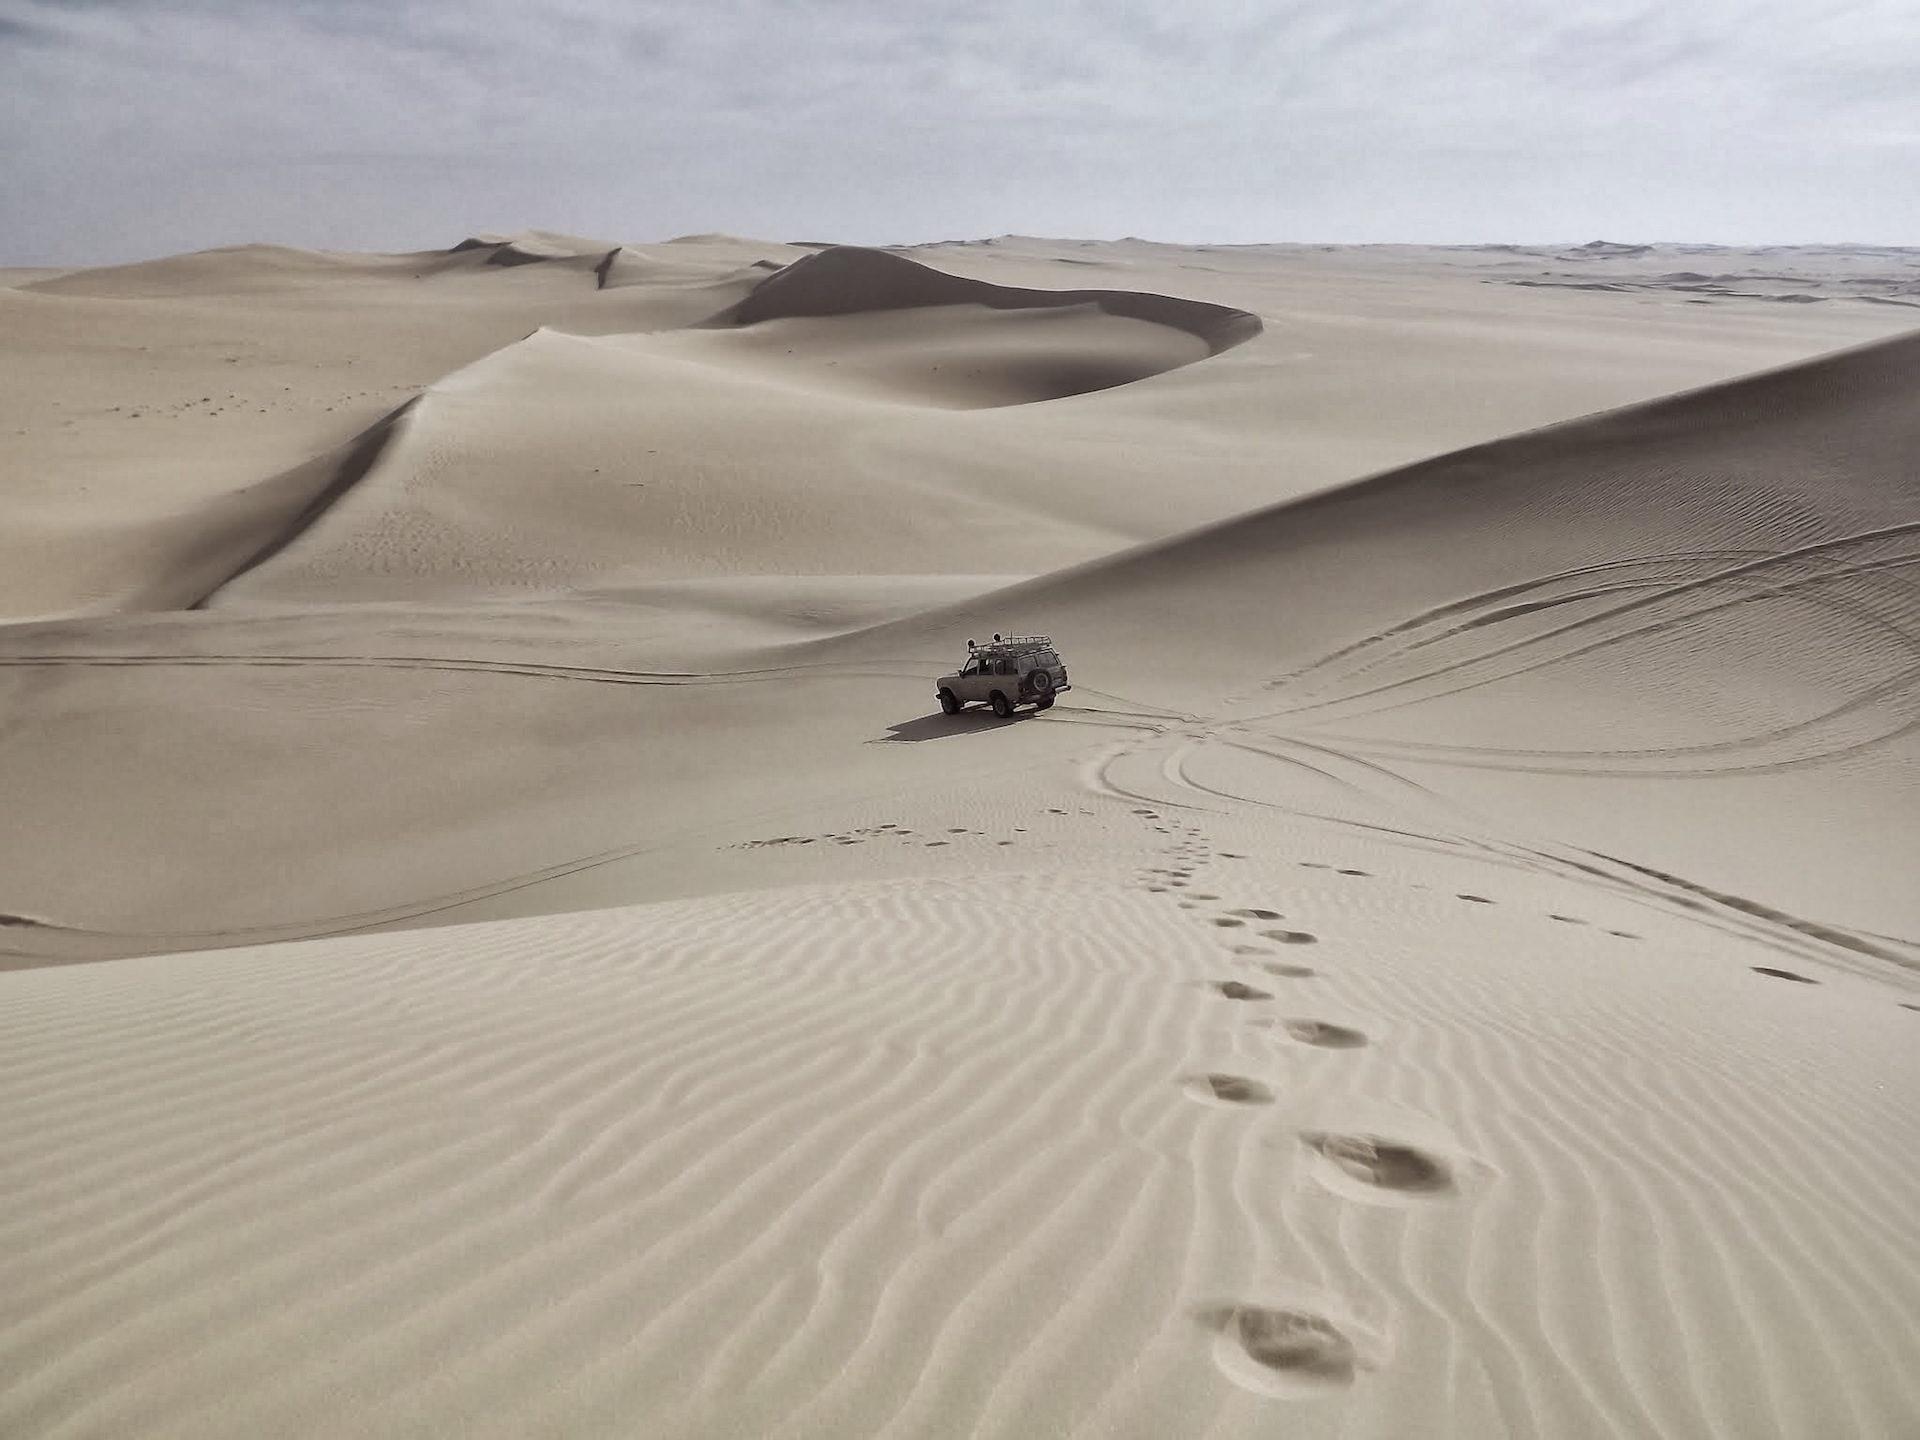 砂漠, 車, huellas, 足跡, 砂丘 - HD の壁紙 - 教授-falken.com